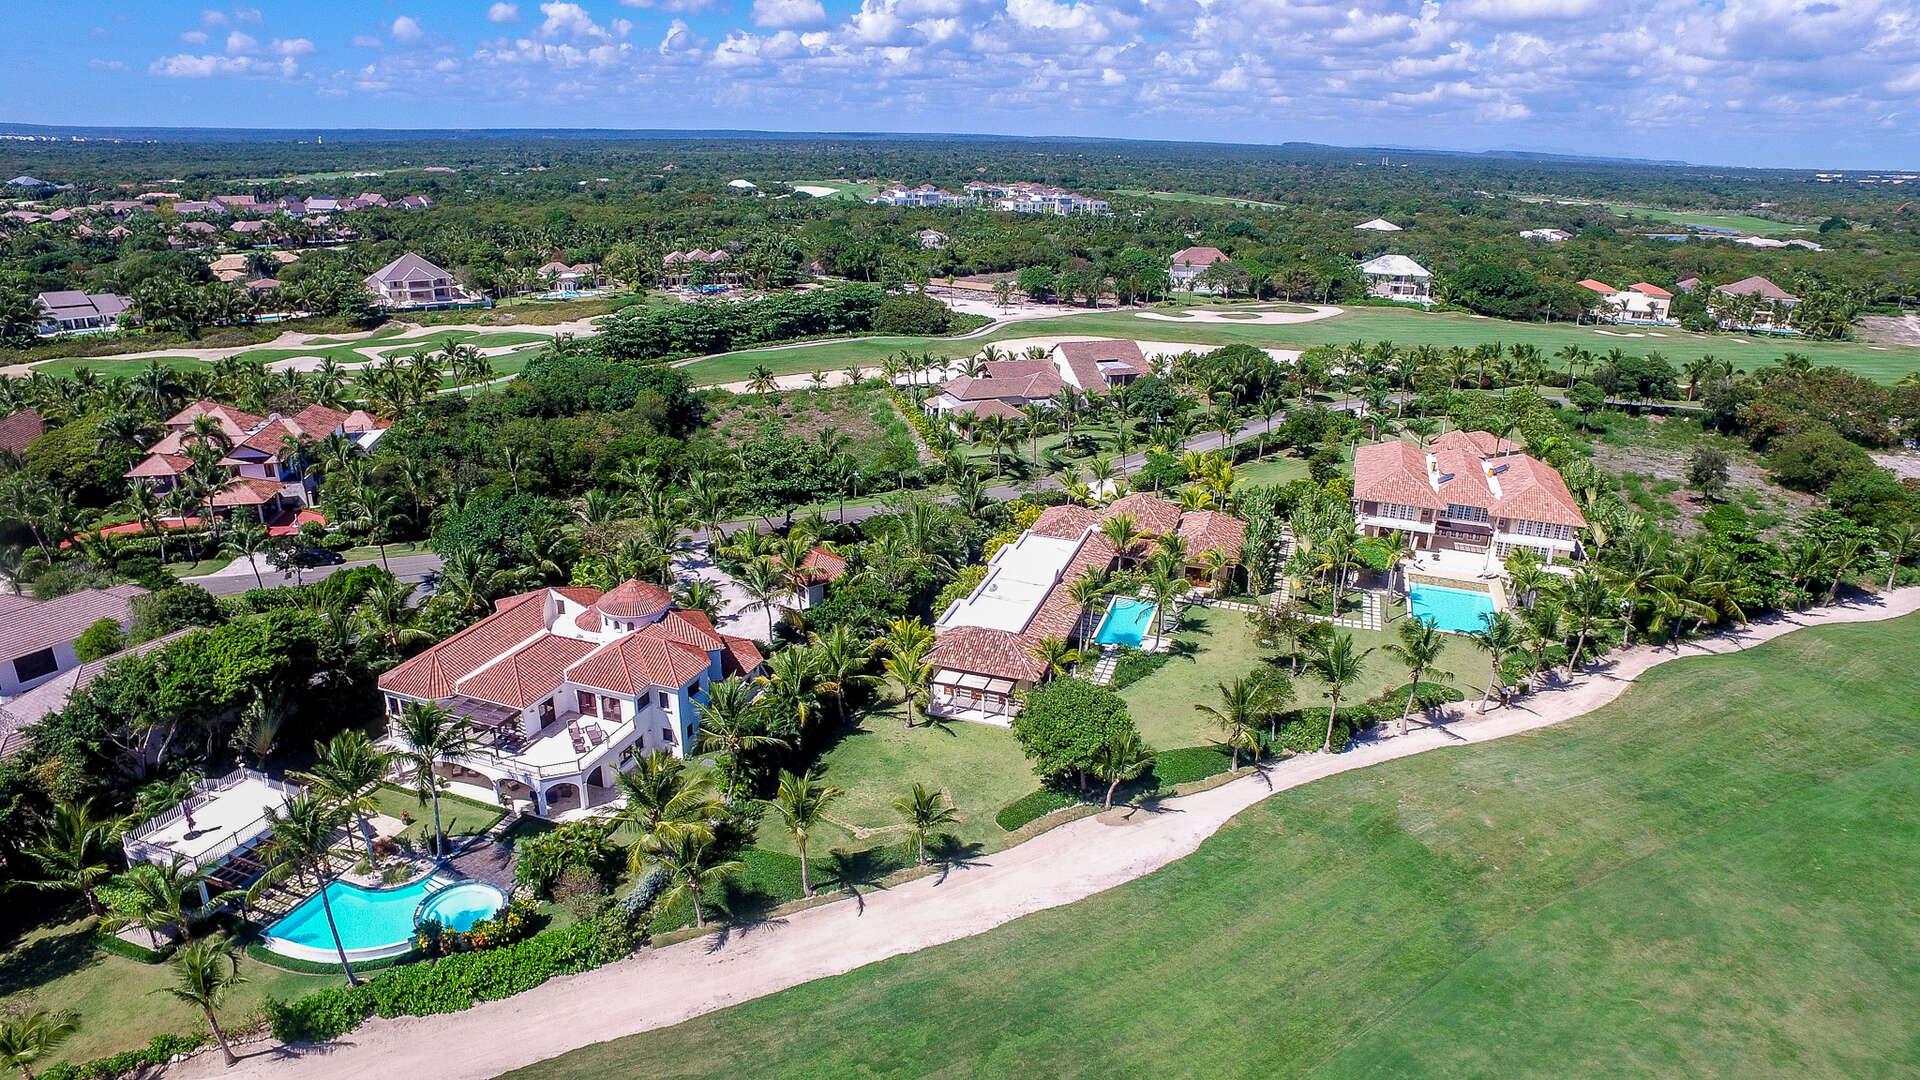 Luxury villa rentals caribbean - Dominican republic - Punta cana - Punta cana resort and club - Arrecife Luxury Estate - Image 1/101